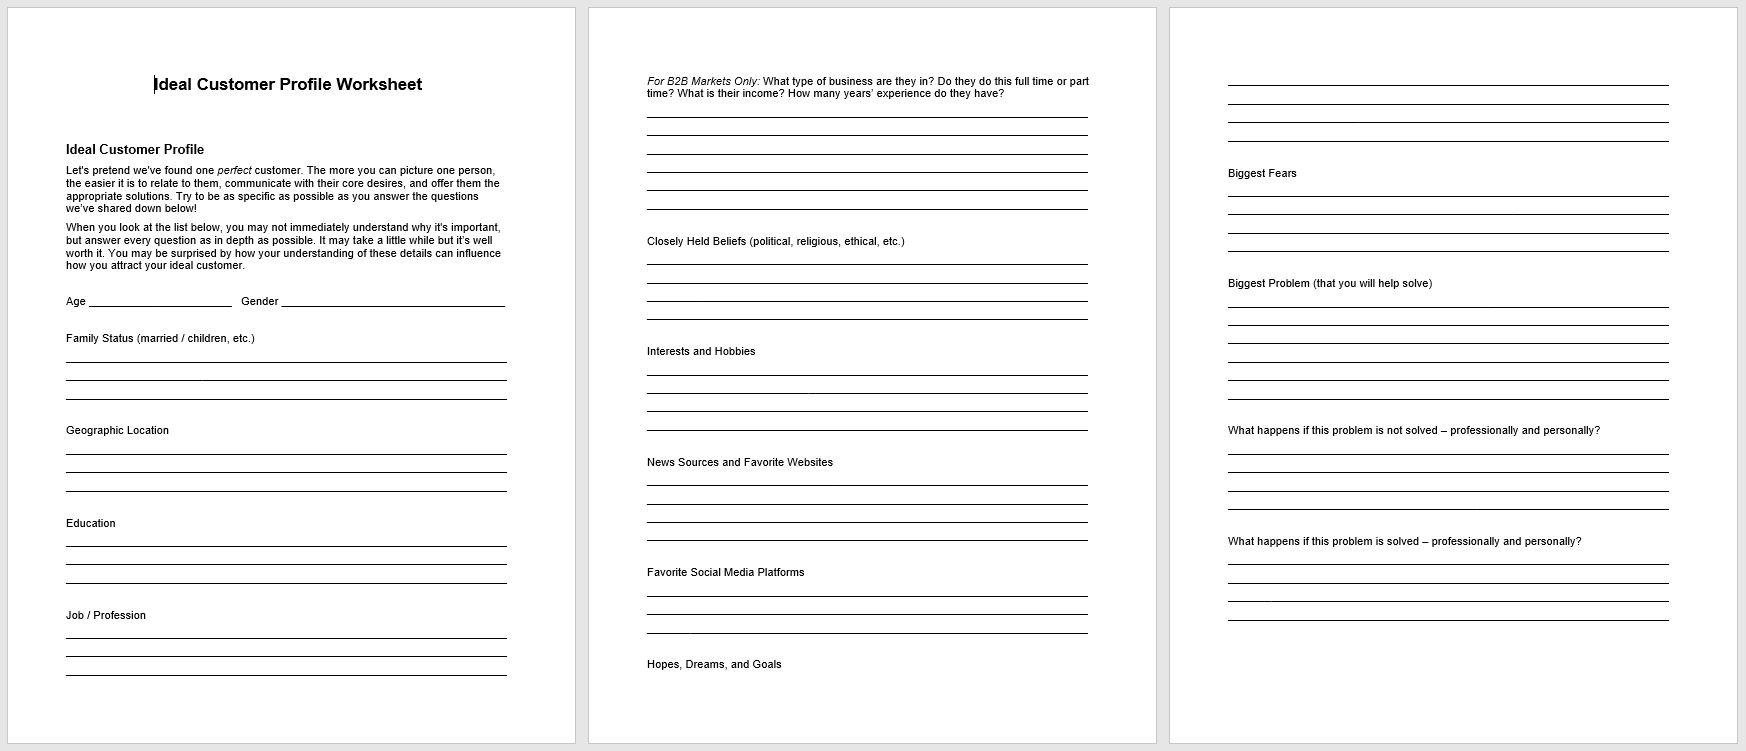 Ideal Customer PLR Worksheet